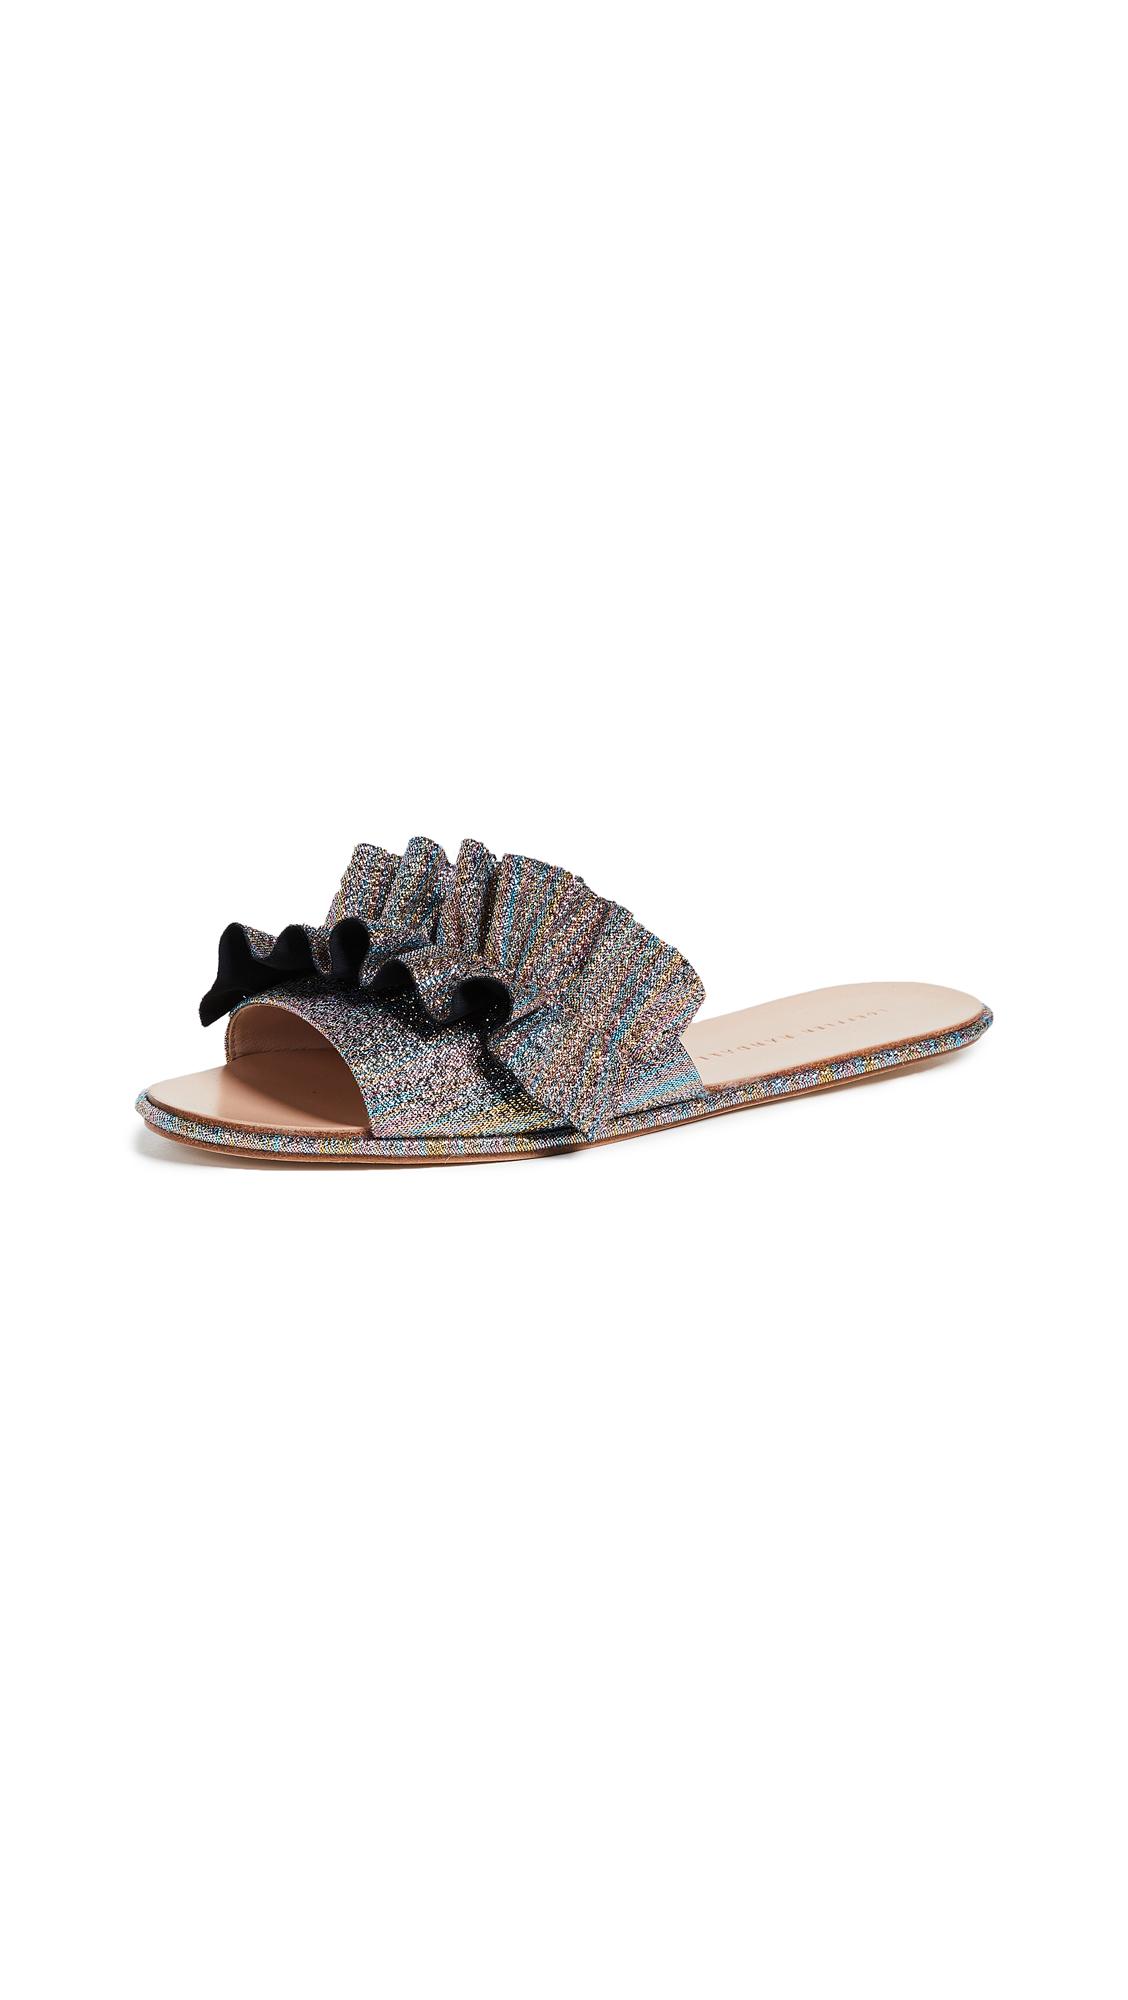 Loeffler Randall Rey Ruffle Slides - Rainbow